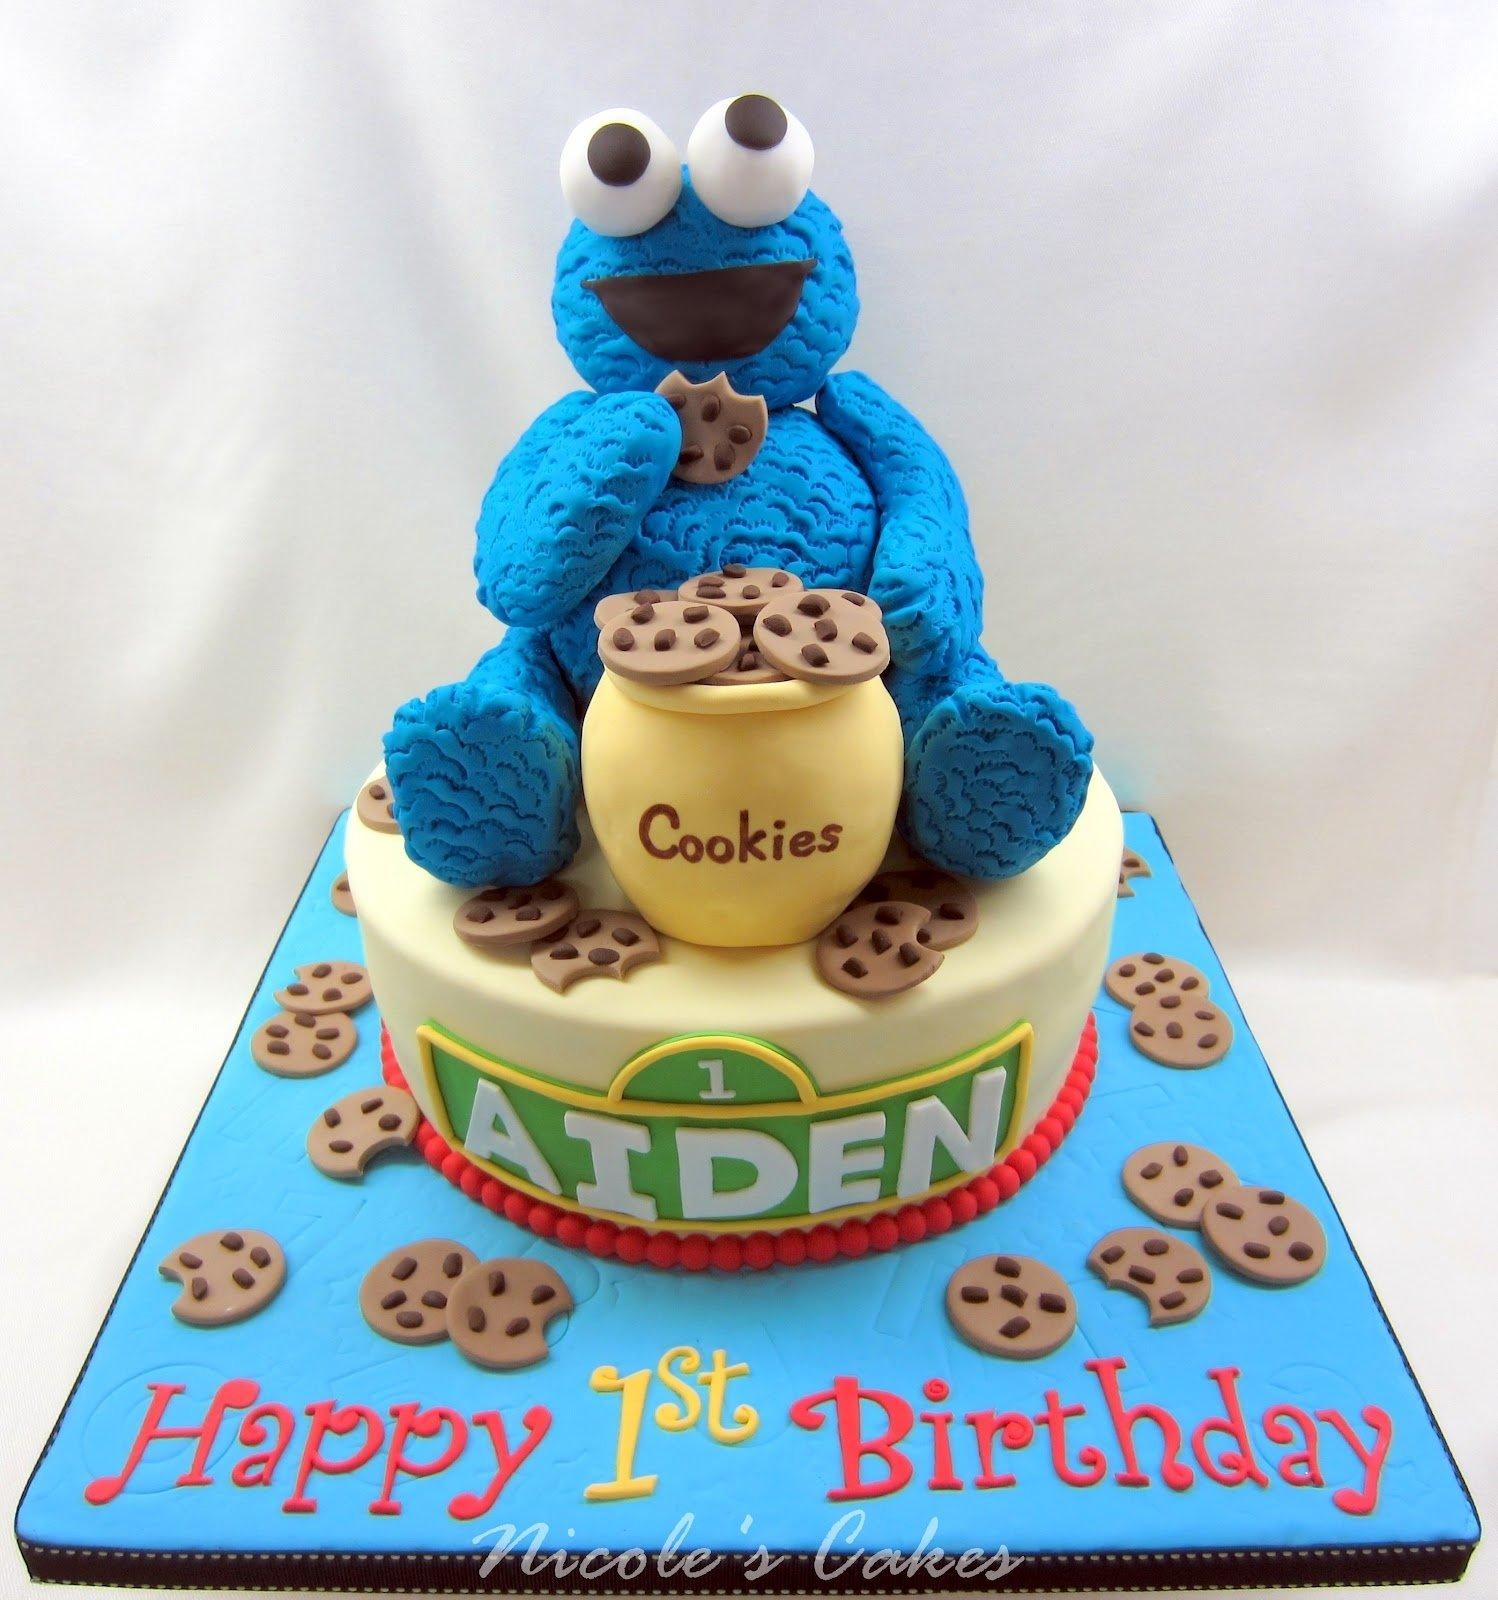 10 Unique First Birthday Cake Ideas Boy on birthday cakes the cookie monster a 1st birthday cake 2021